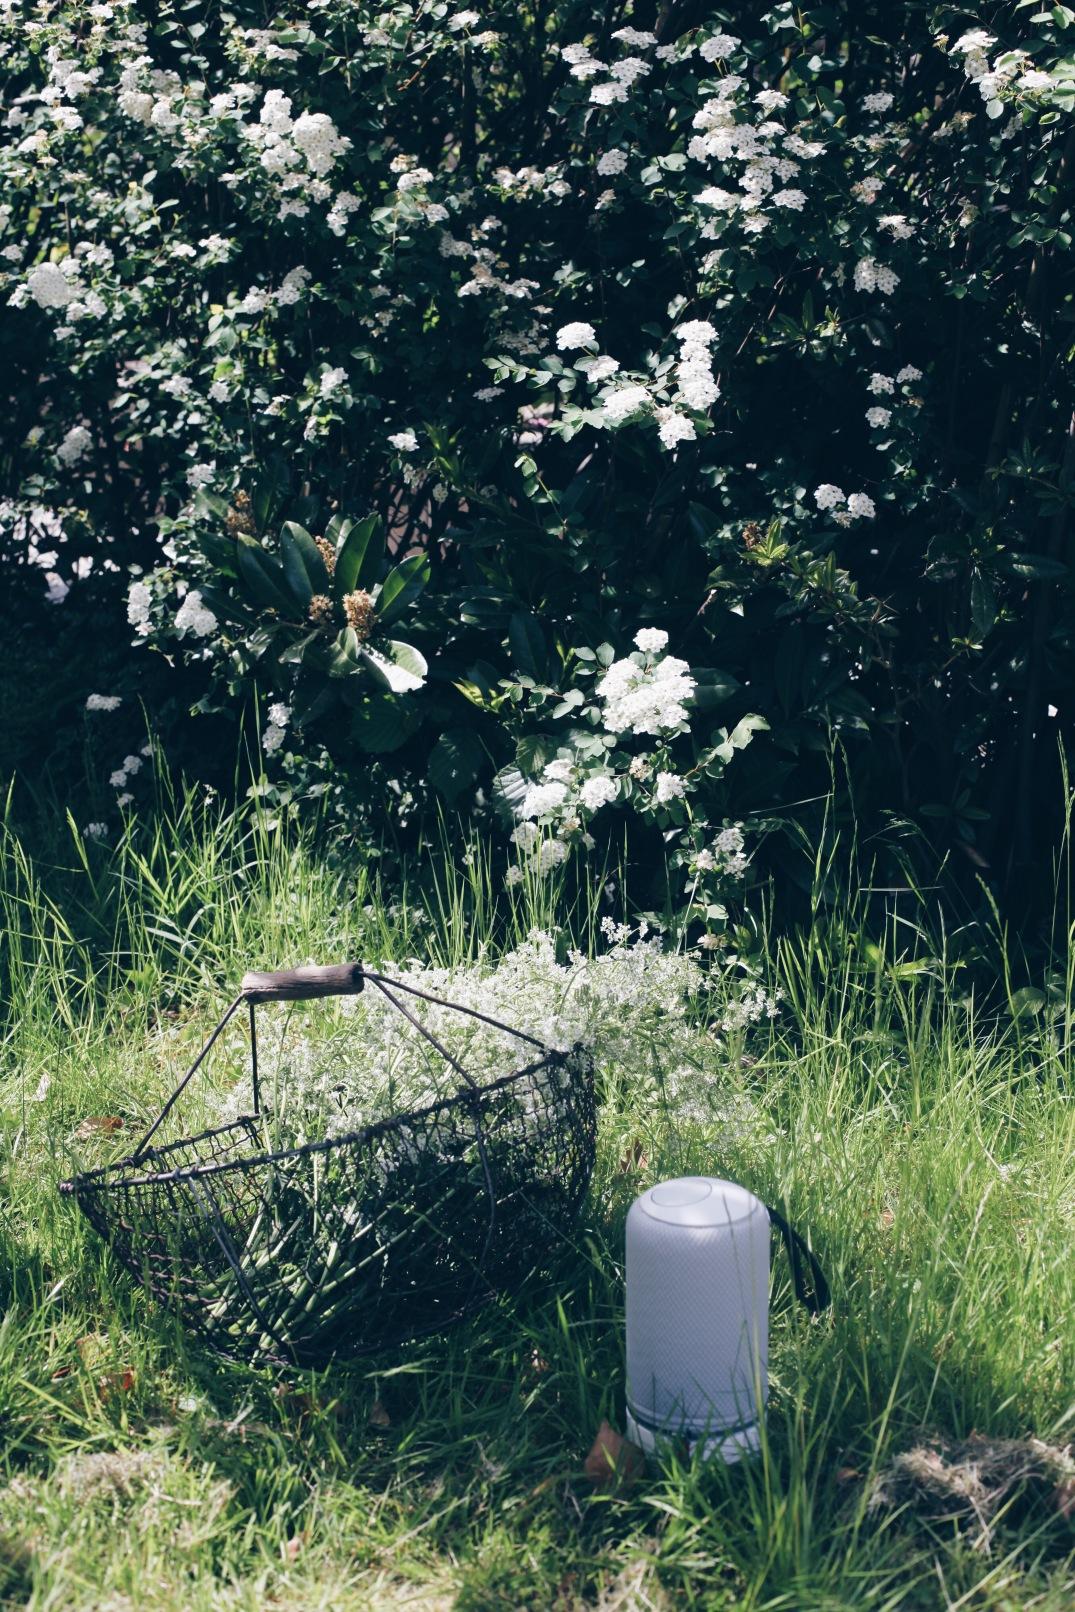 Libratone speaker in the garden via anastasiabenko.com